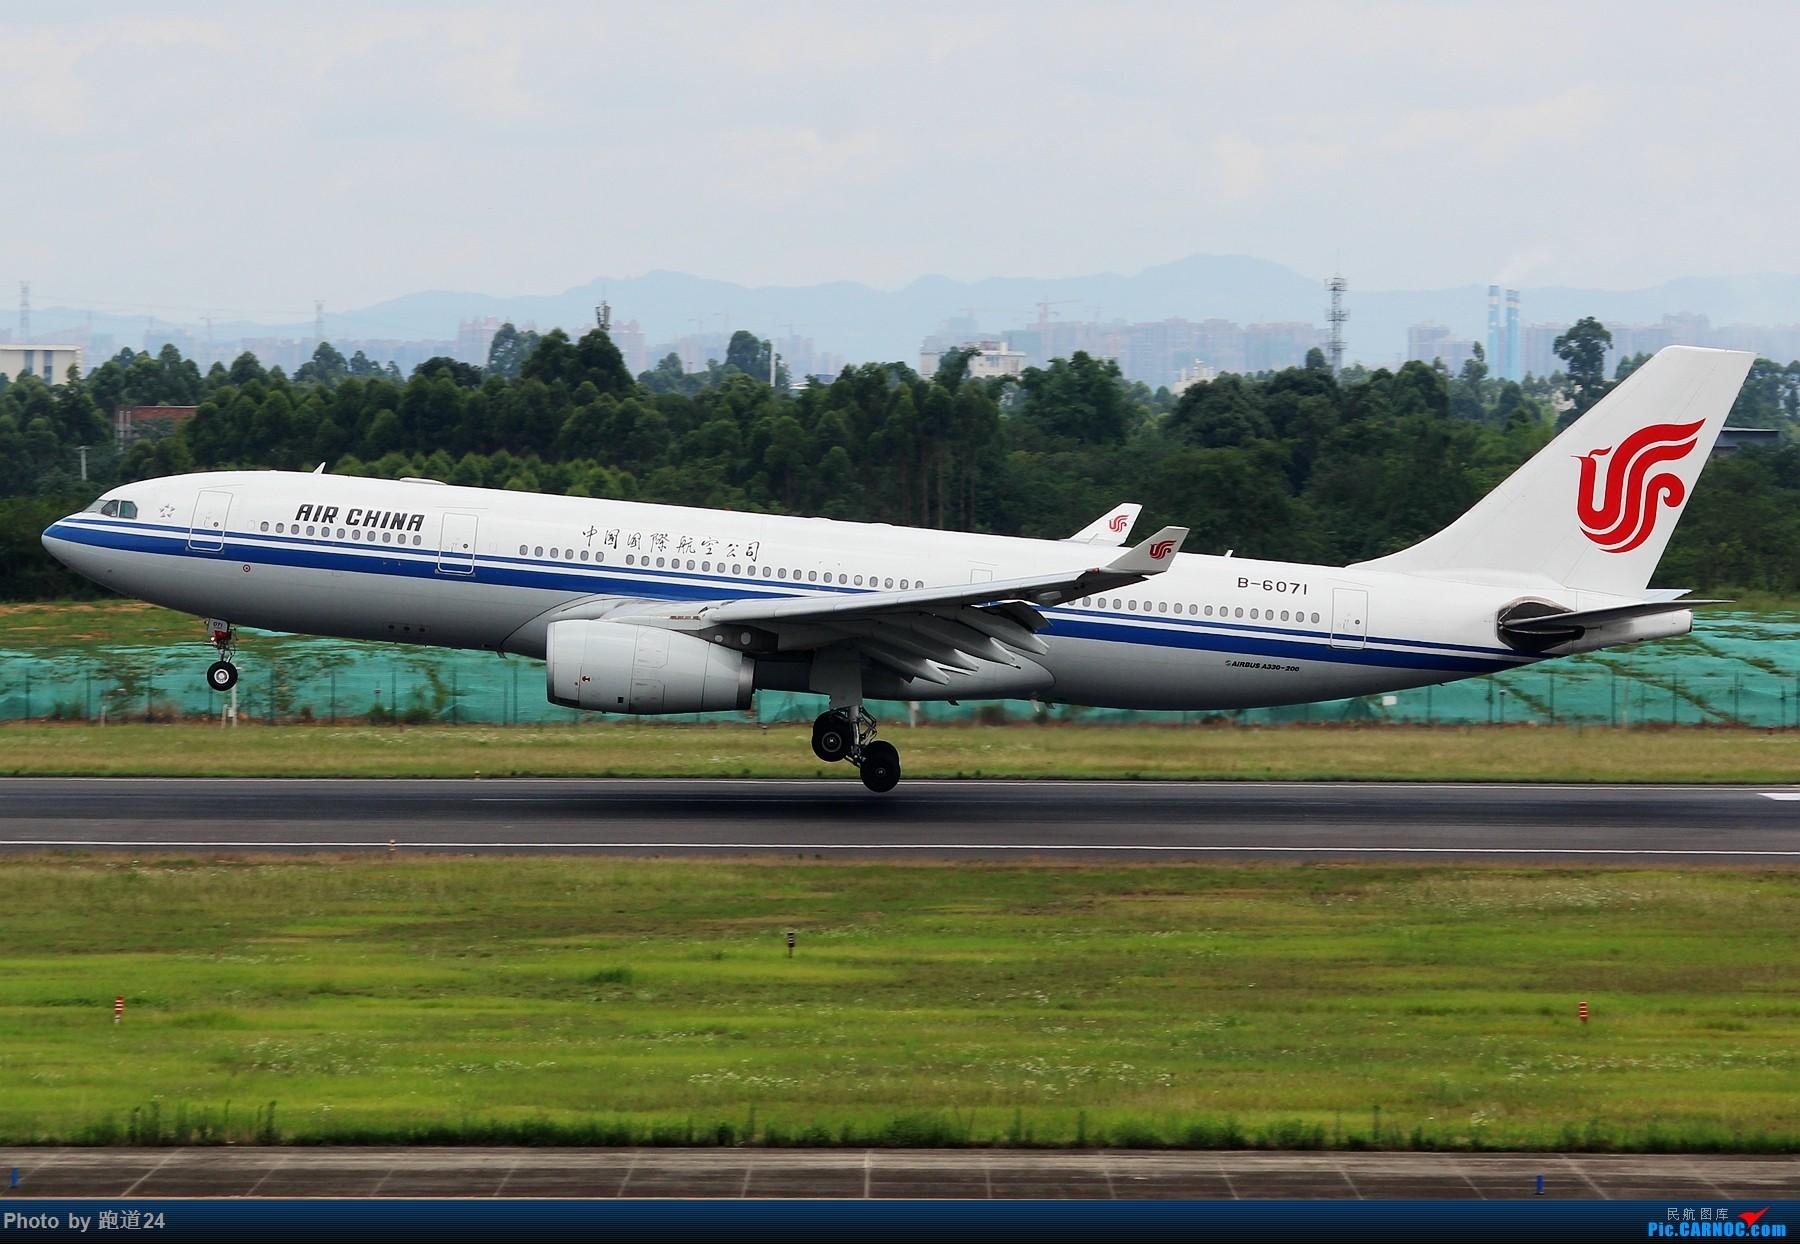 Re:[原创]【多图党】6月18日成都拍机【埃塞俄比亚航空B777-200LR】 AIRBUS A330-200 B-6071 中国成都双流国际机场